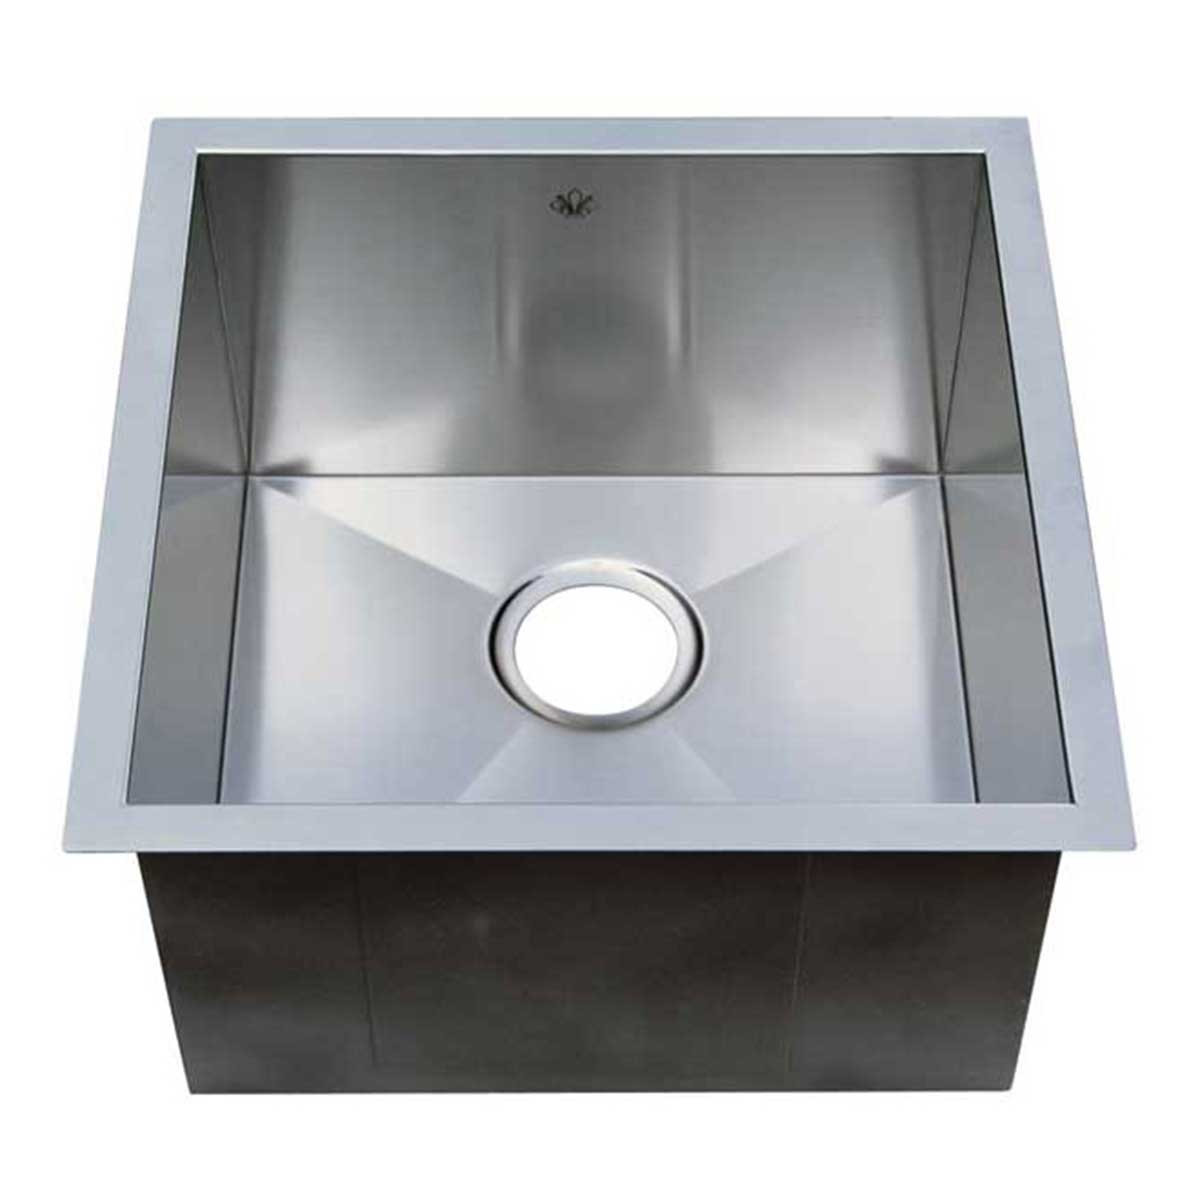 Artisan Chef Pro Single Bowl Sink